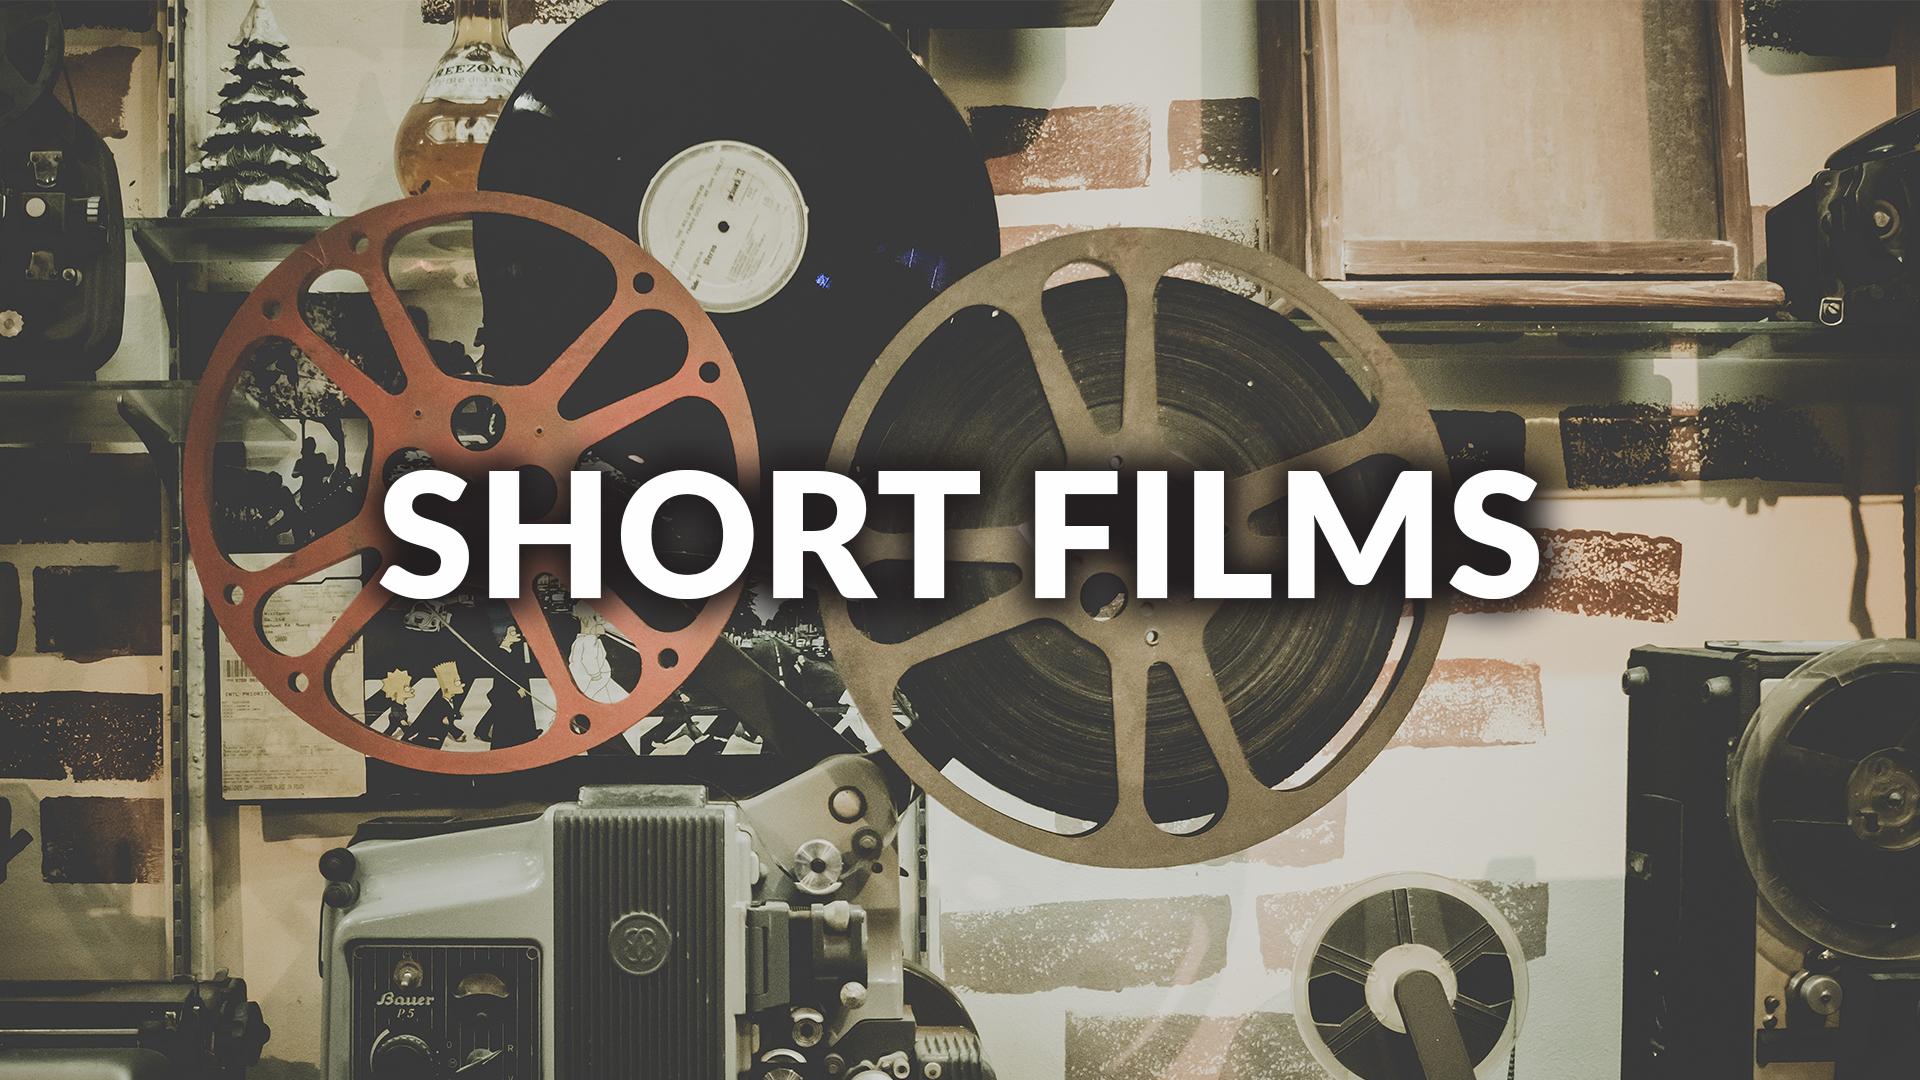 peter-c-davidson-short-films.jpg